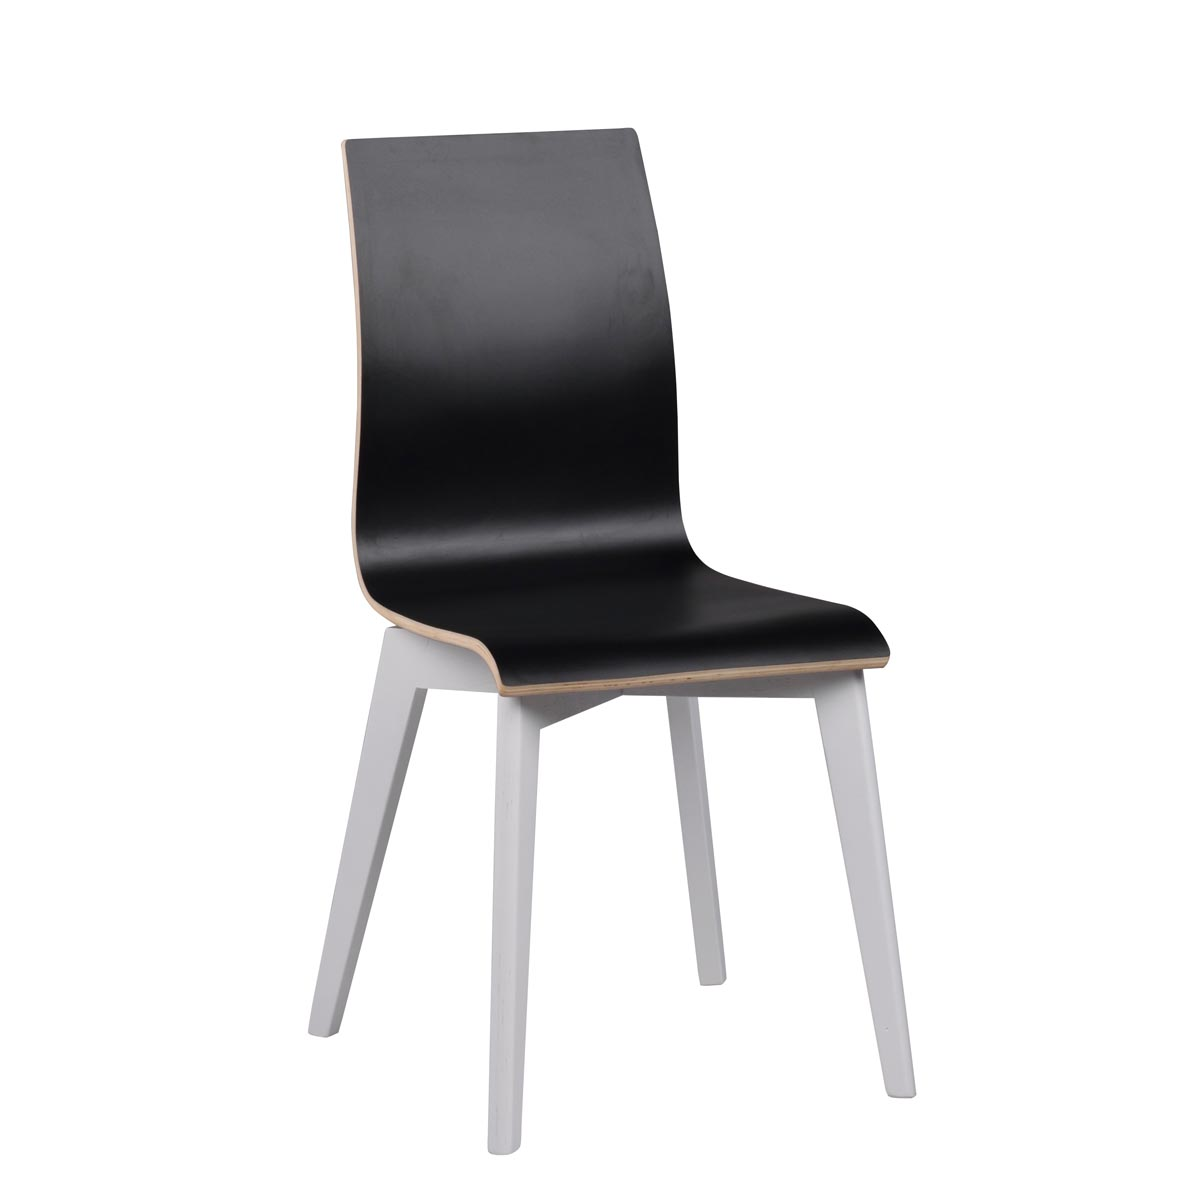 Febe-stol-svart-laminat-vit-Grace-113633